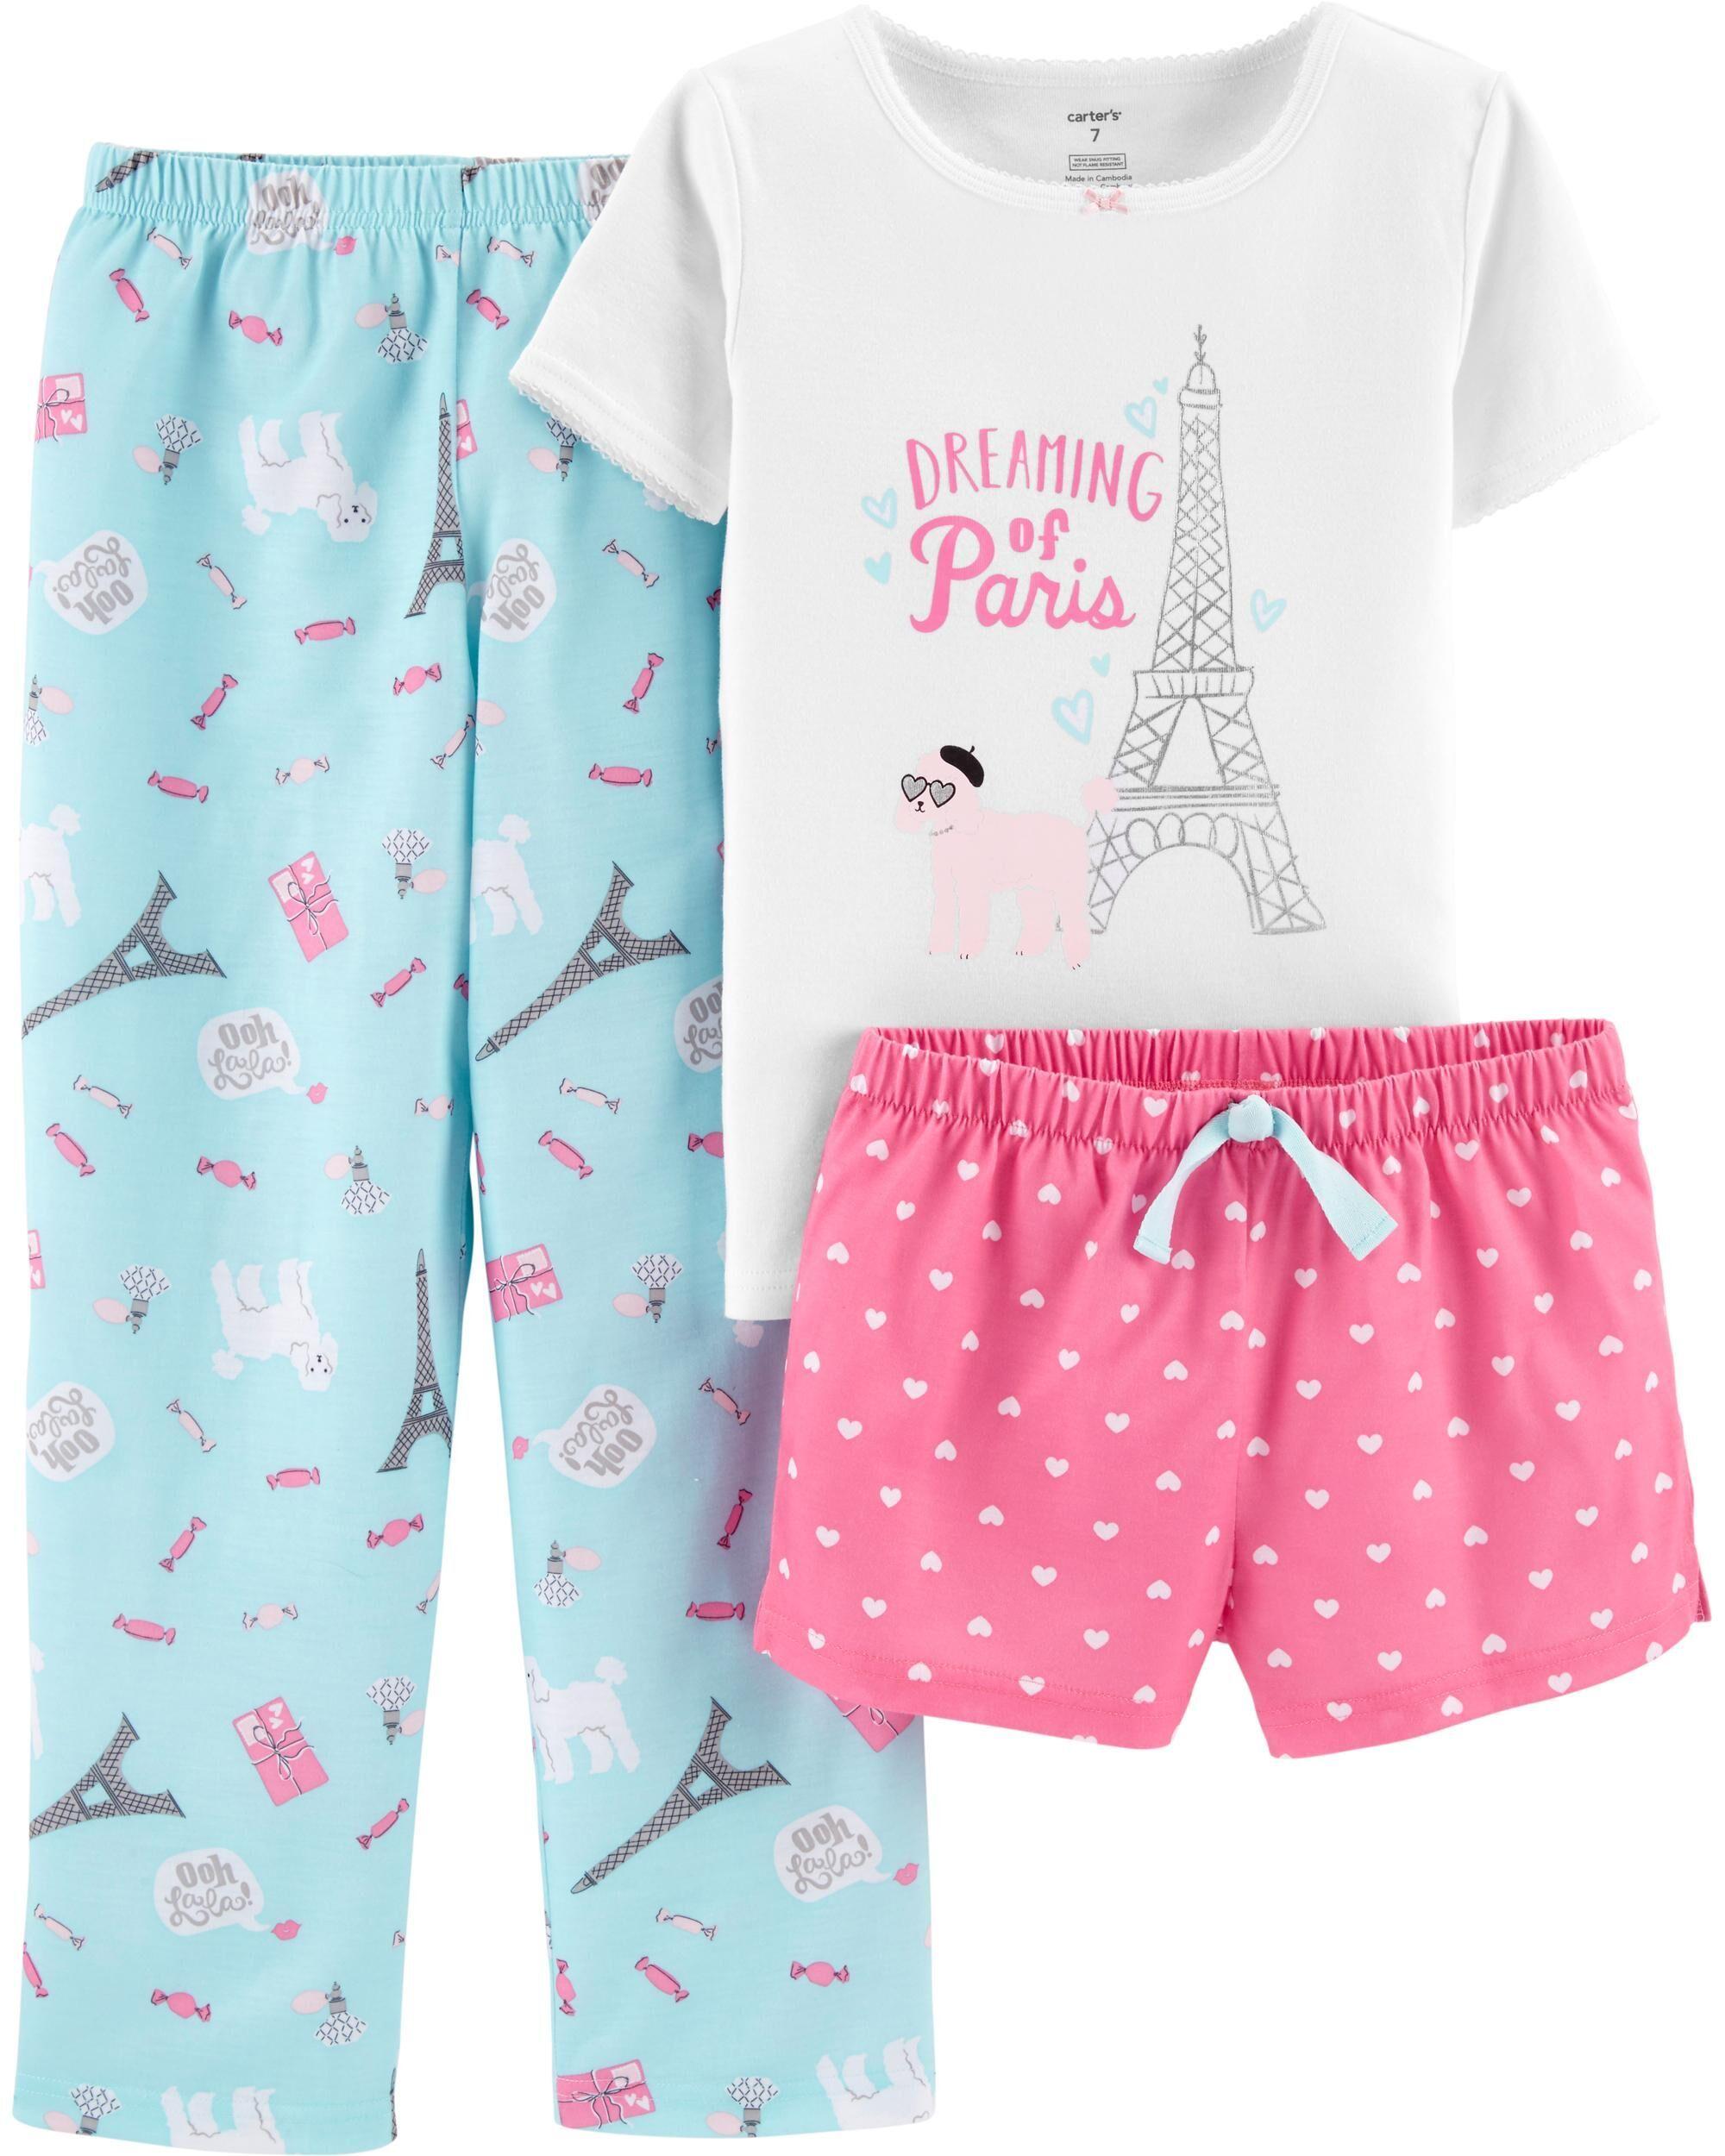 Always Happy, Newborn Carters Little Girls 3 Piece Pajama Clothing Set